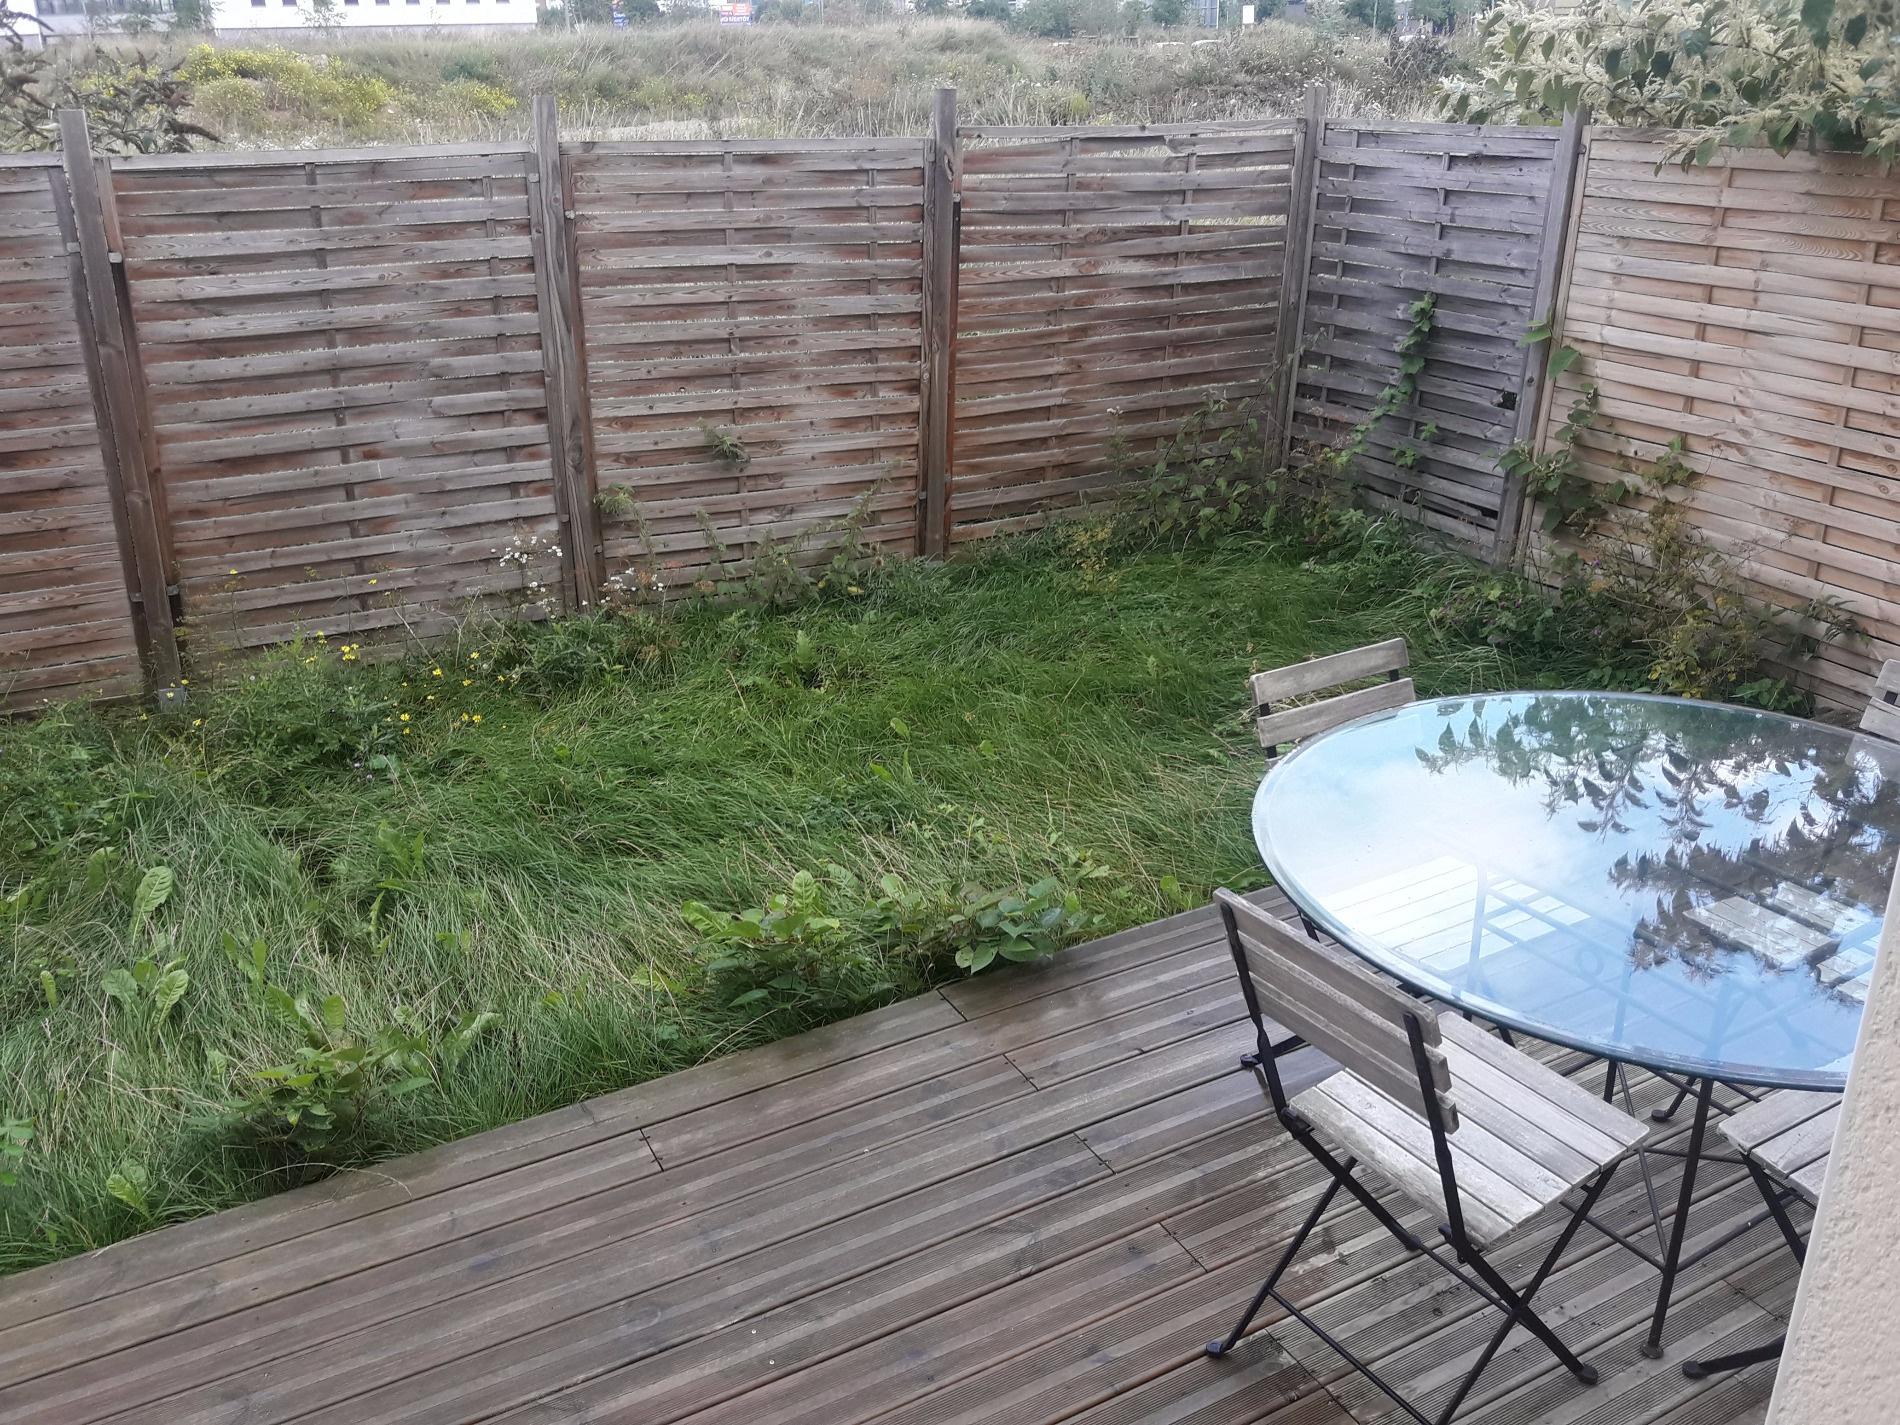 Vente belle maison nancy proche kin polis avec jardin - Maison jardin furniture nancy ...